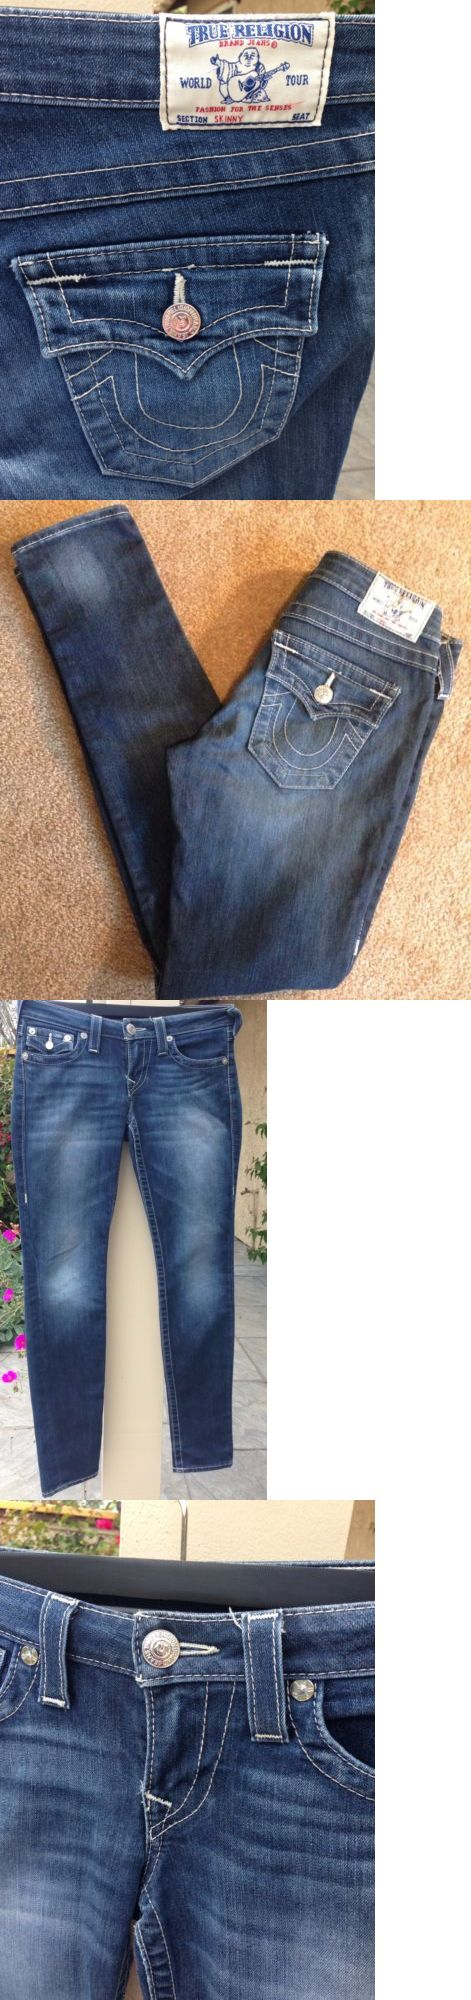 Jeans 11554: True Religion Jeans Skinny W Flaps Womens Sz 27 Pencil Leg Dark Blue #112790 -> BUY IT NOW ONLY: $43 on eBay!